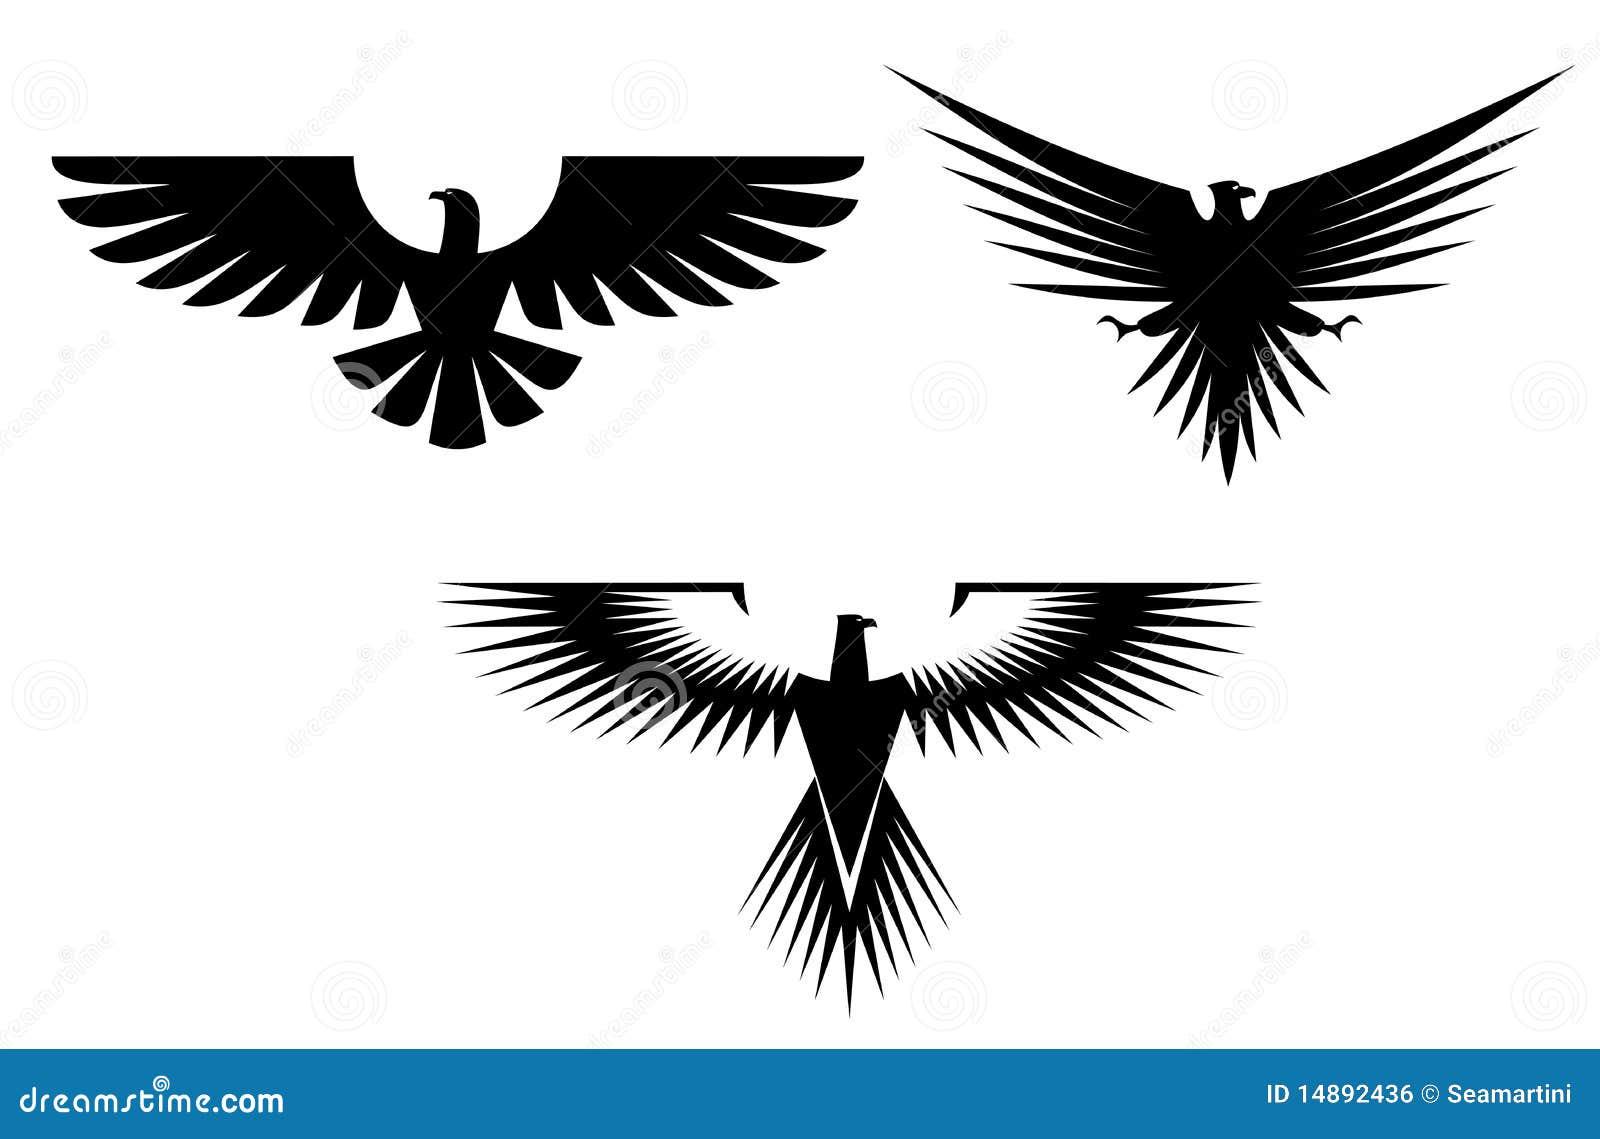 0ec1c33ea Eagle tattoos stock vector. Illustration of graphic, label - 14892436